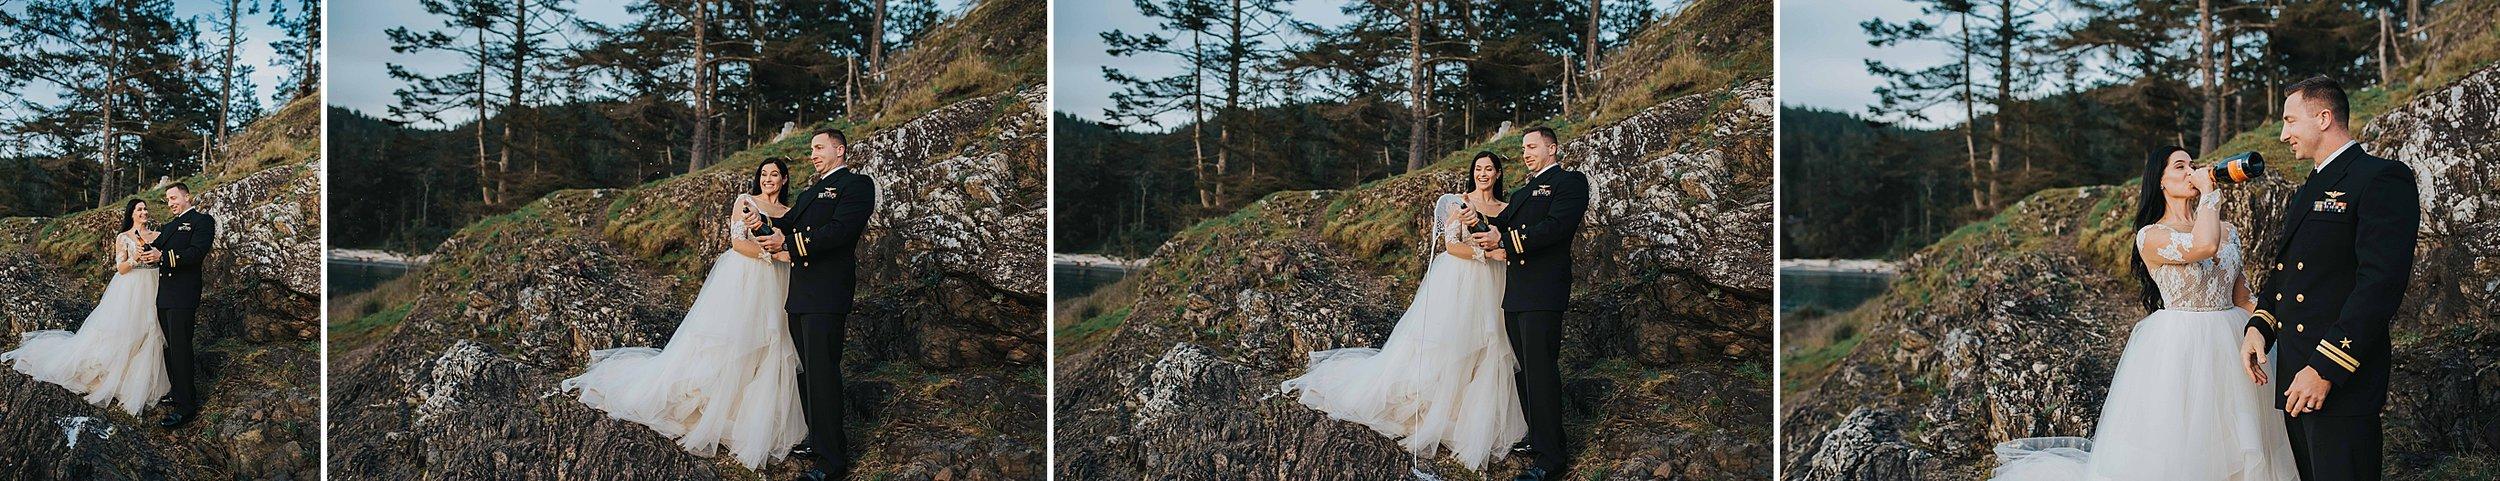 KC-Wedding-photographer-J HODGES PHOTOGRAPHY_0262.jpg